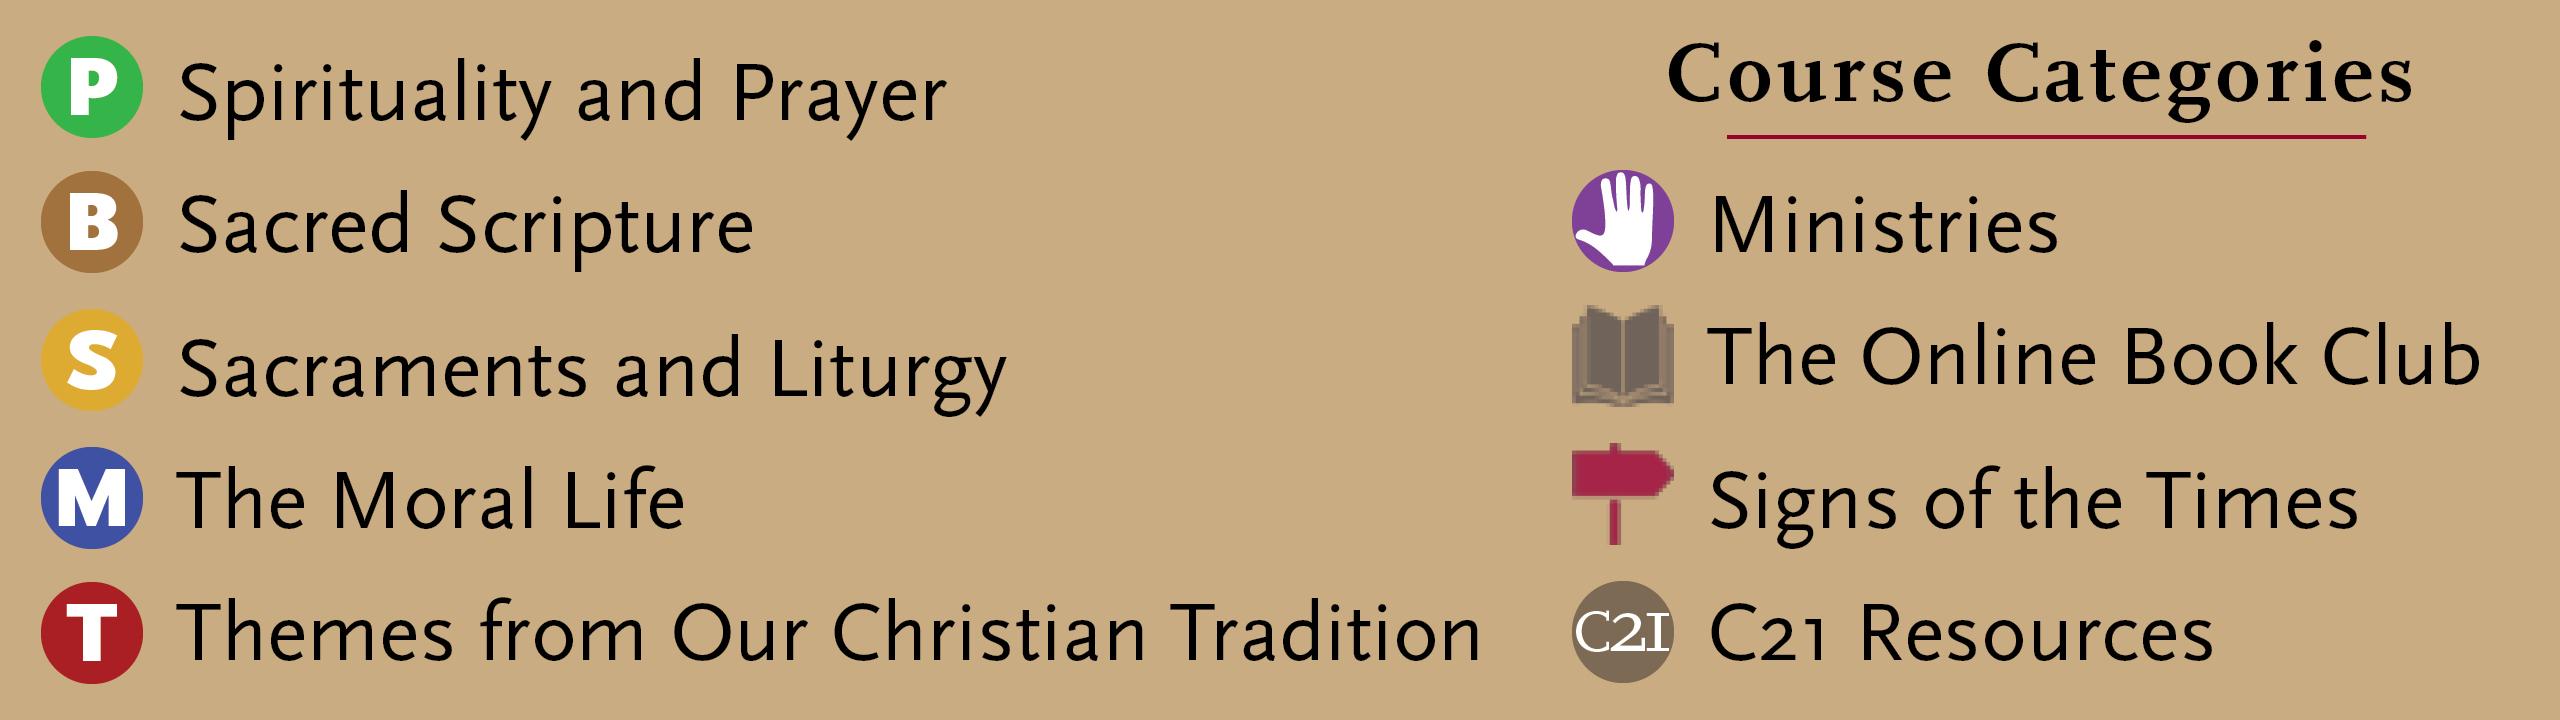 Sacred Scripture - STM Online: Crossroads - Boston College